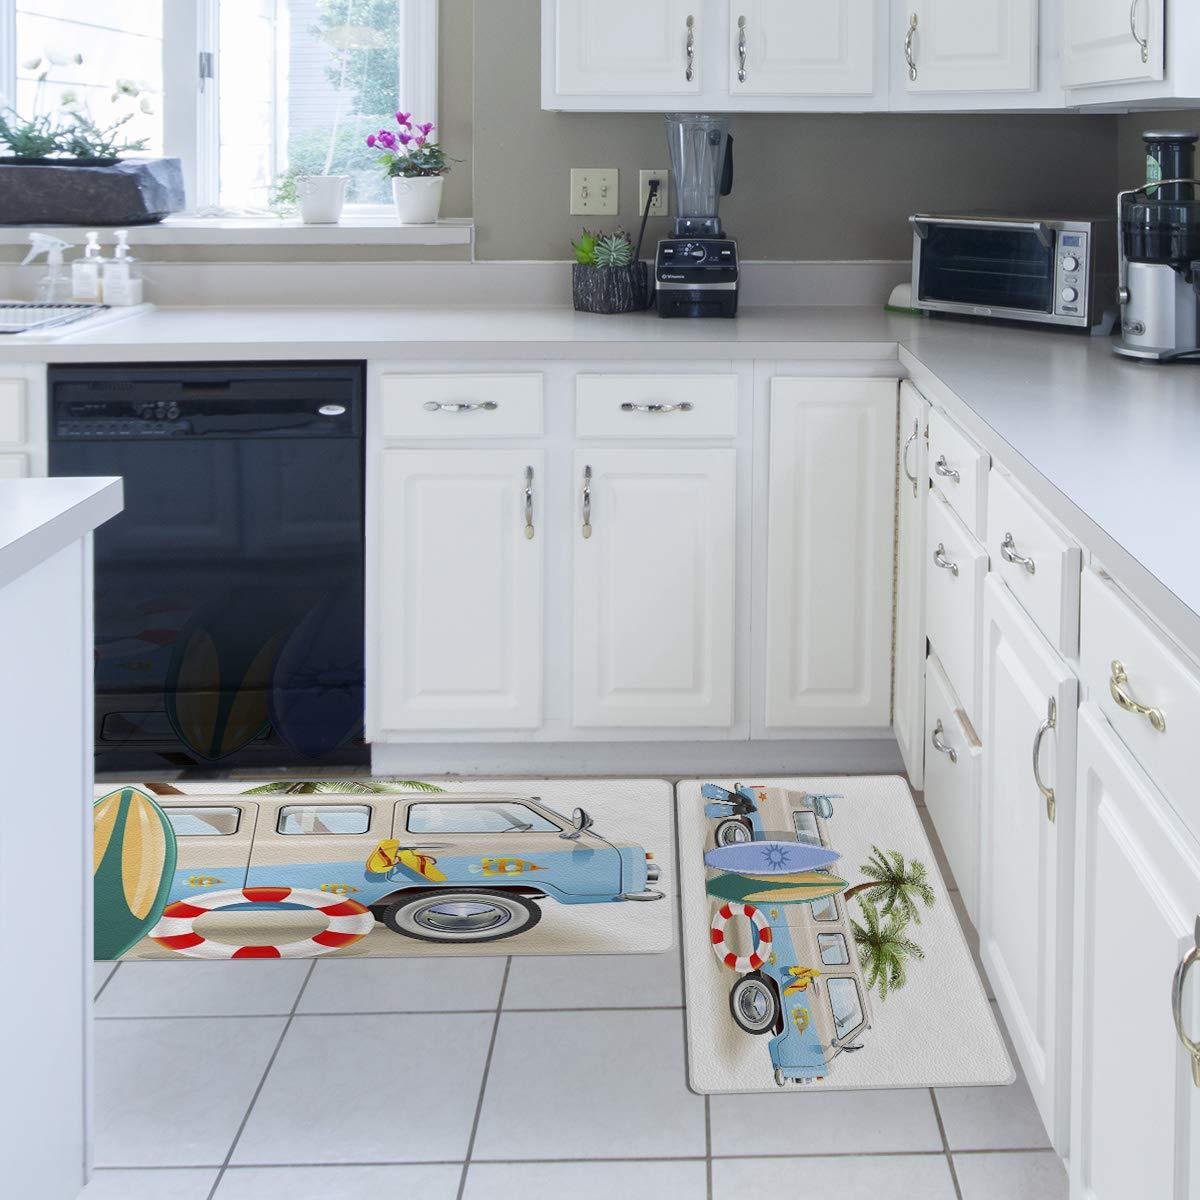 18 x 48 Prime Leader Kitchen Door Mats Set of 2 Stain Resistant Comfort Carpet Soft Non-Slip PVC Backing Floor Mats Runner Rugs Set Delicious Sushi from Japan 18 x 30